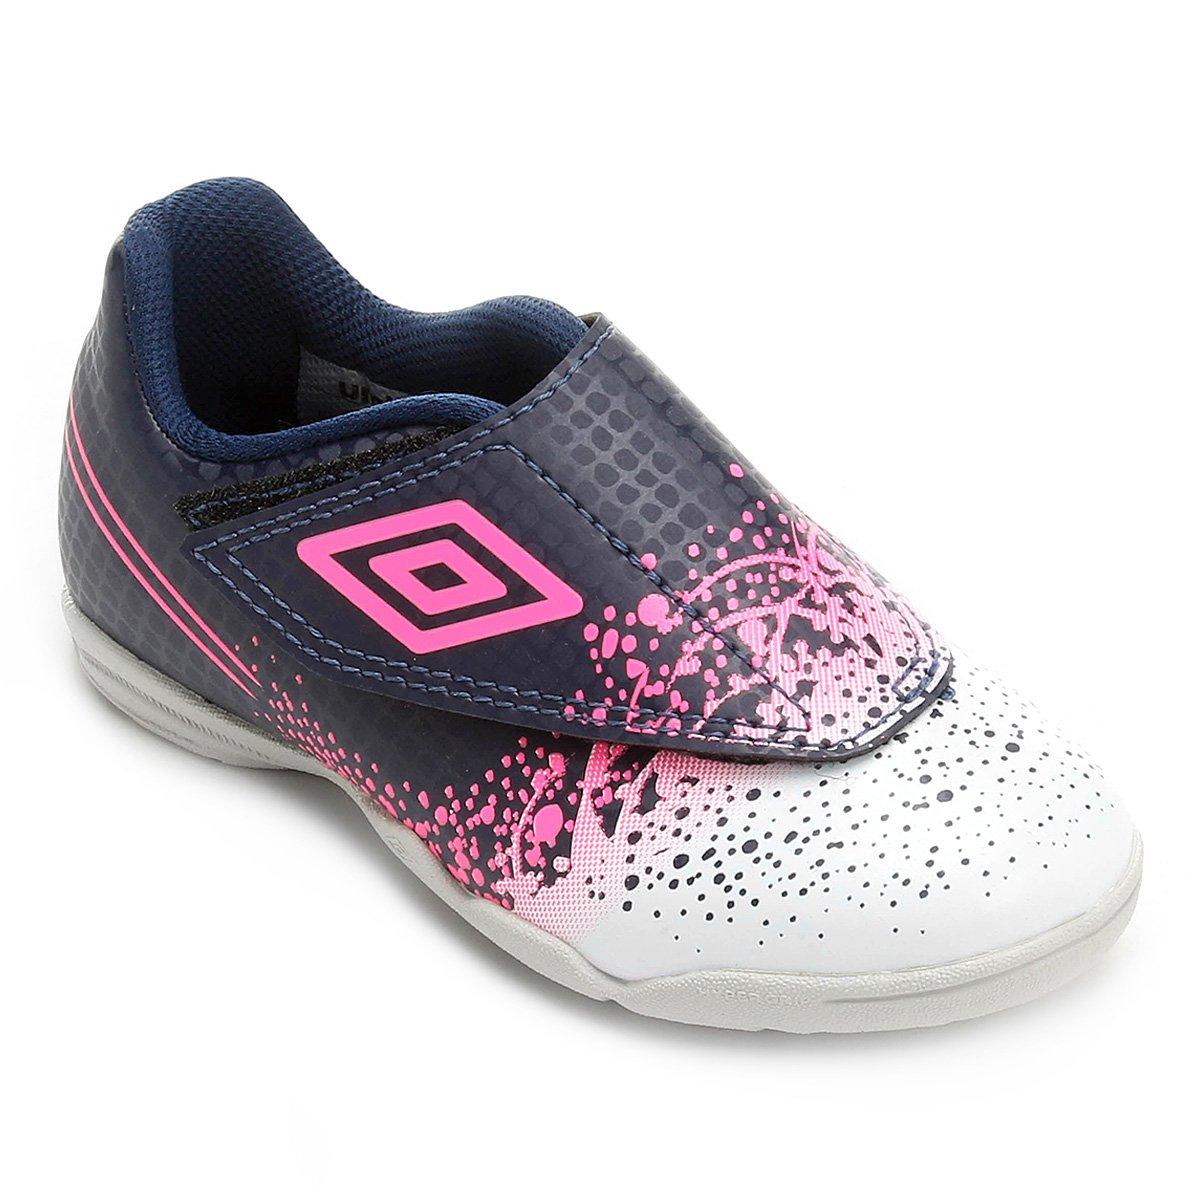 15e014737d47c Chuteira Futsal Infantil Umbro Wave - Compre Agora